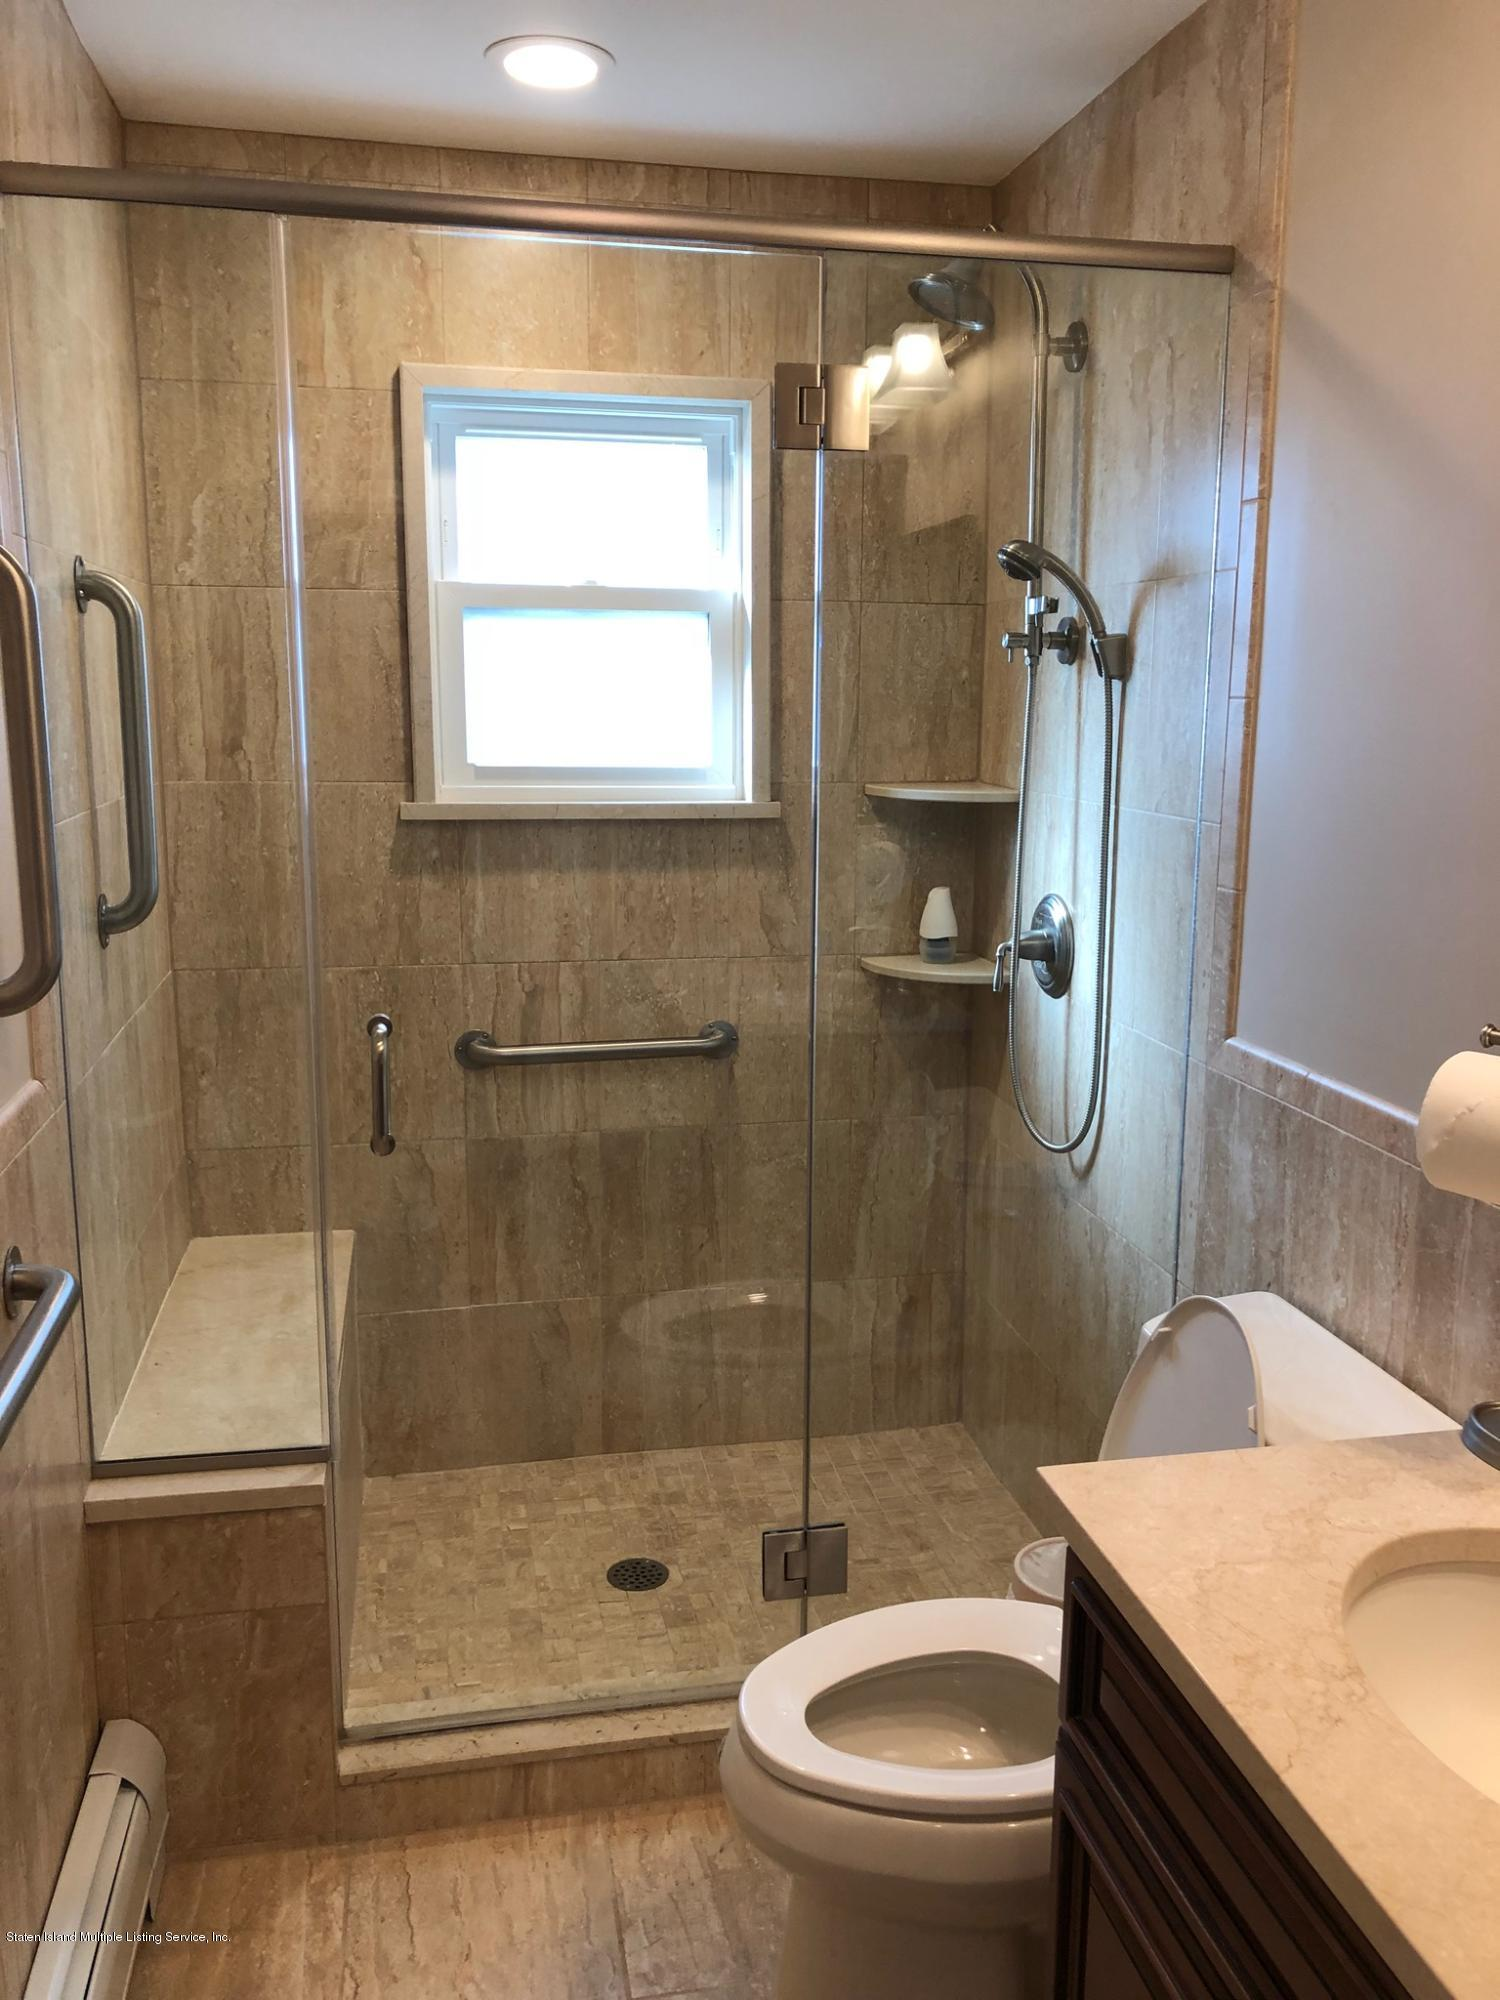 170 Katan Avenue,Staten Island,New York,10308,United States,3 Bedrooms Bedrooms,6 Rooms Rooms,2 BathroomsBathrooms,Residential,Katan,1124592